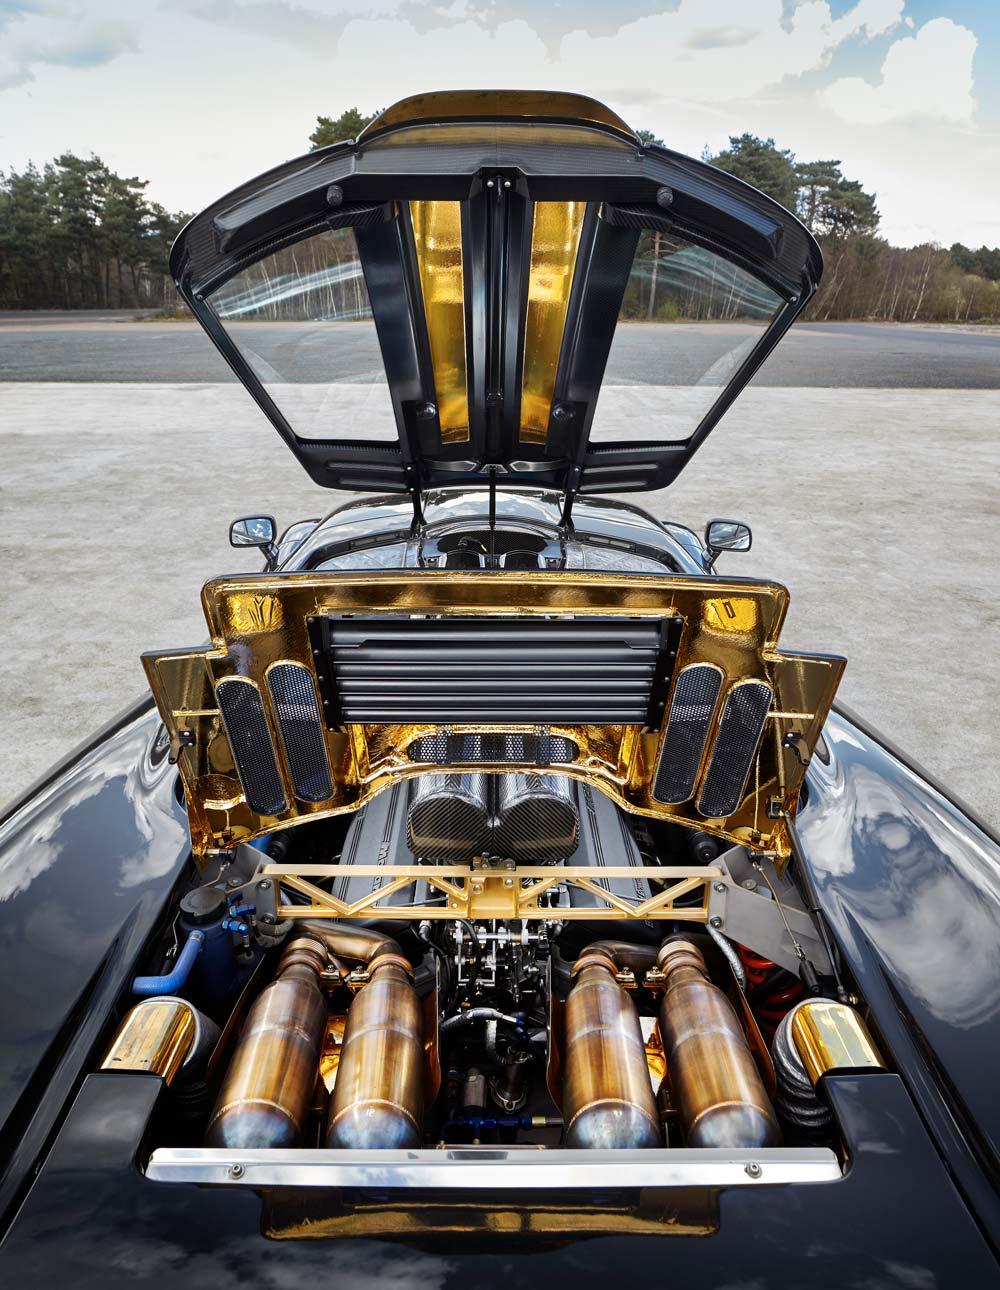 2018 McLaren F1 engine